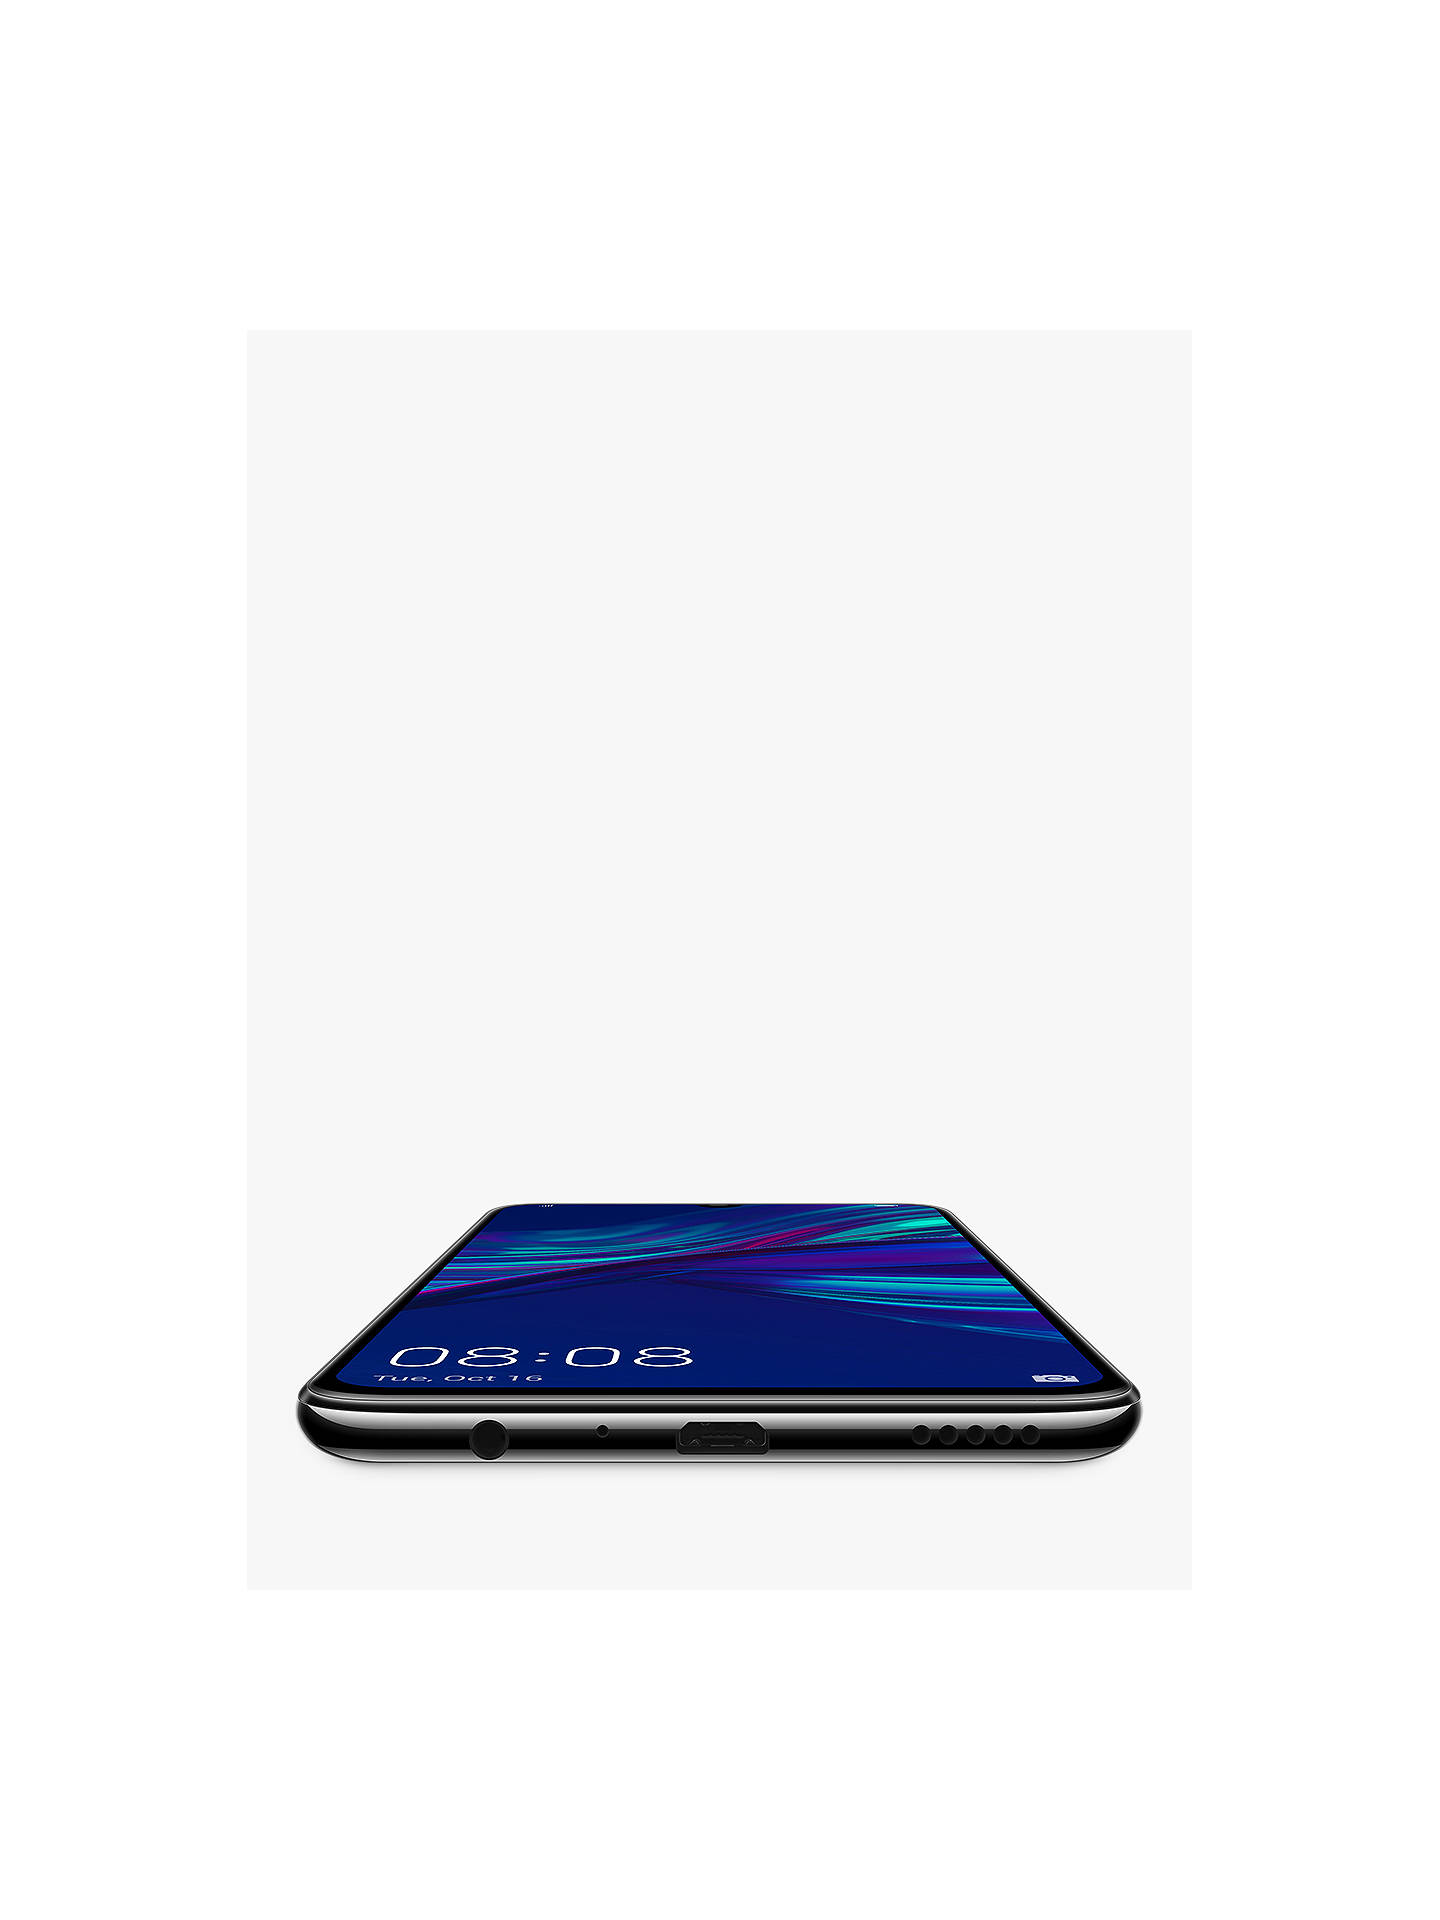 "Huawei P smart 2019 Smartphone, Android, 6 21"", 4G LTE, SIM Free, 64GB,  Black"